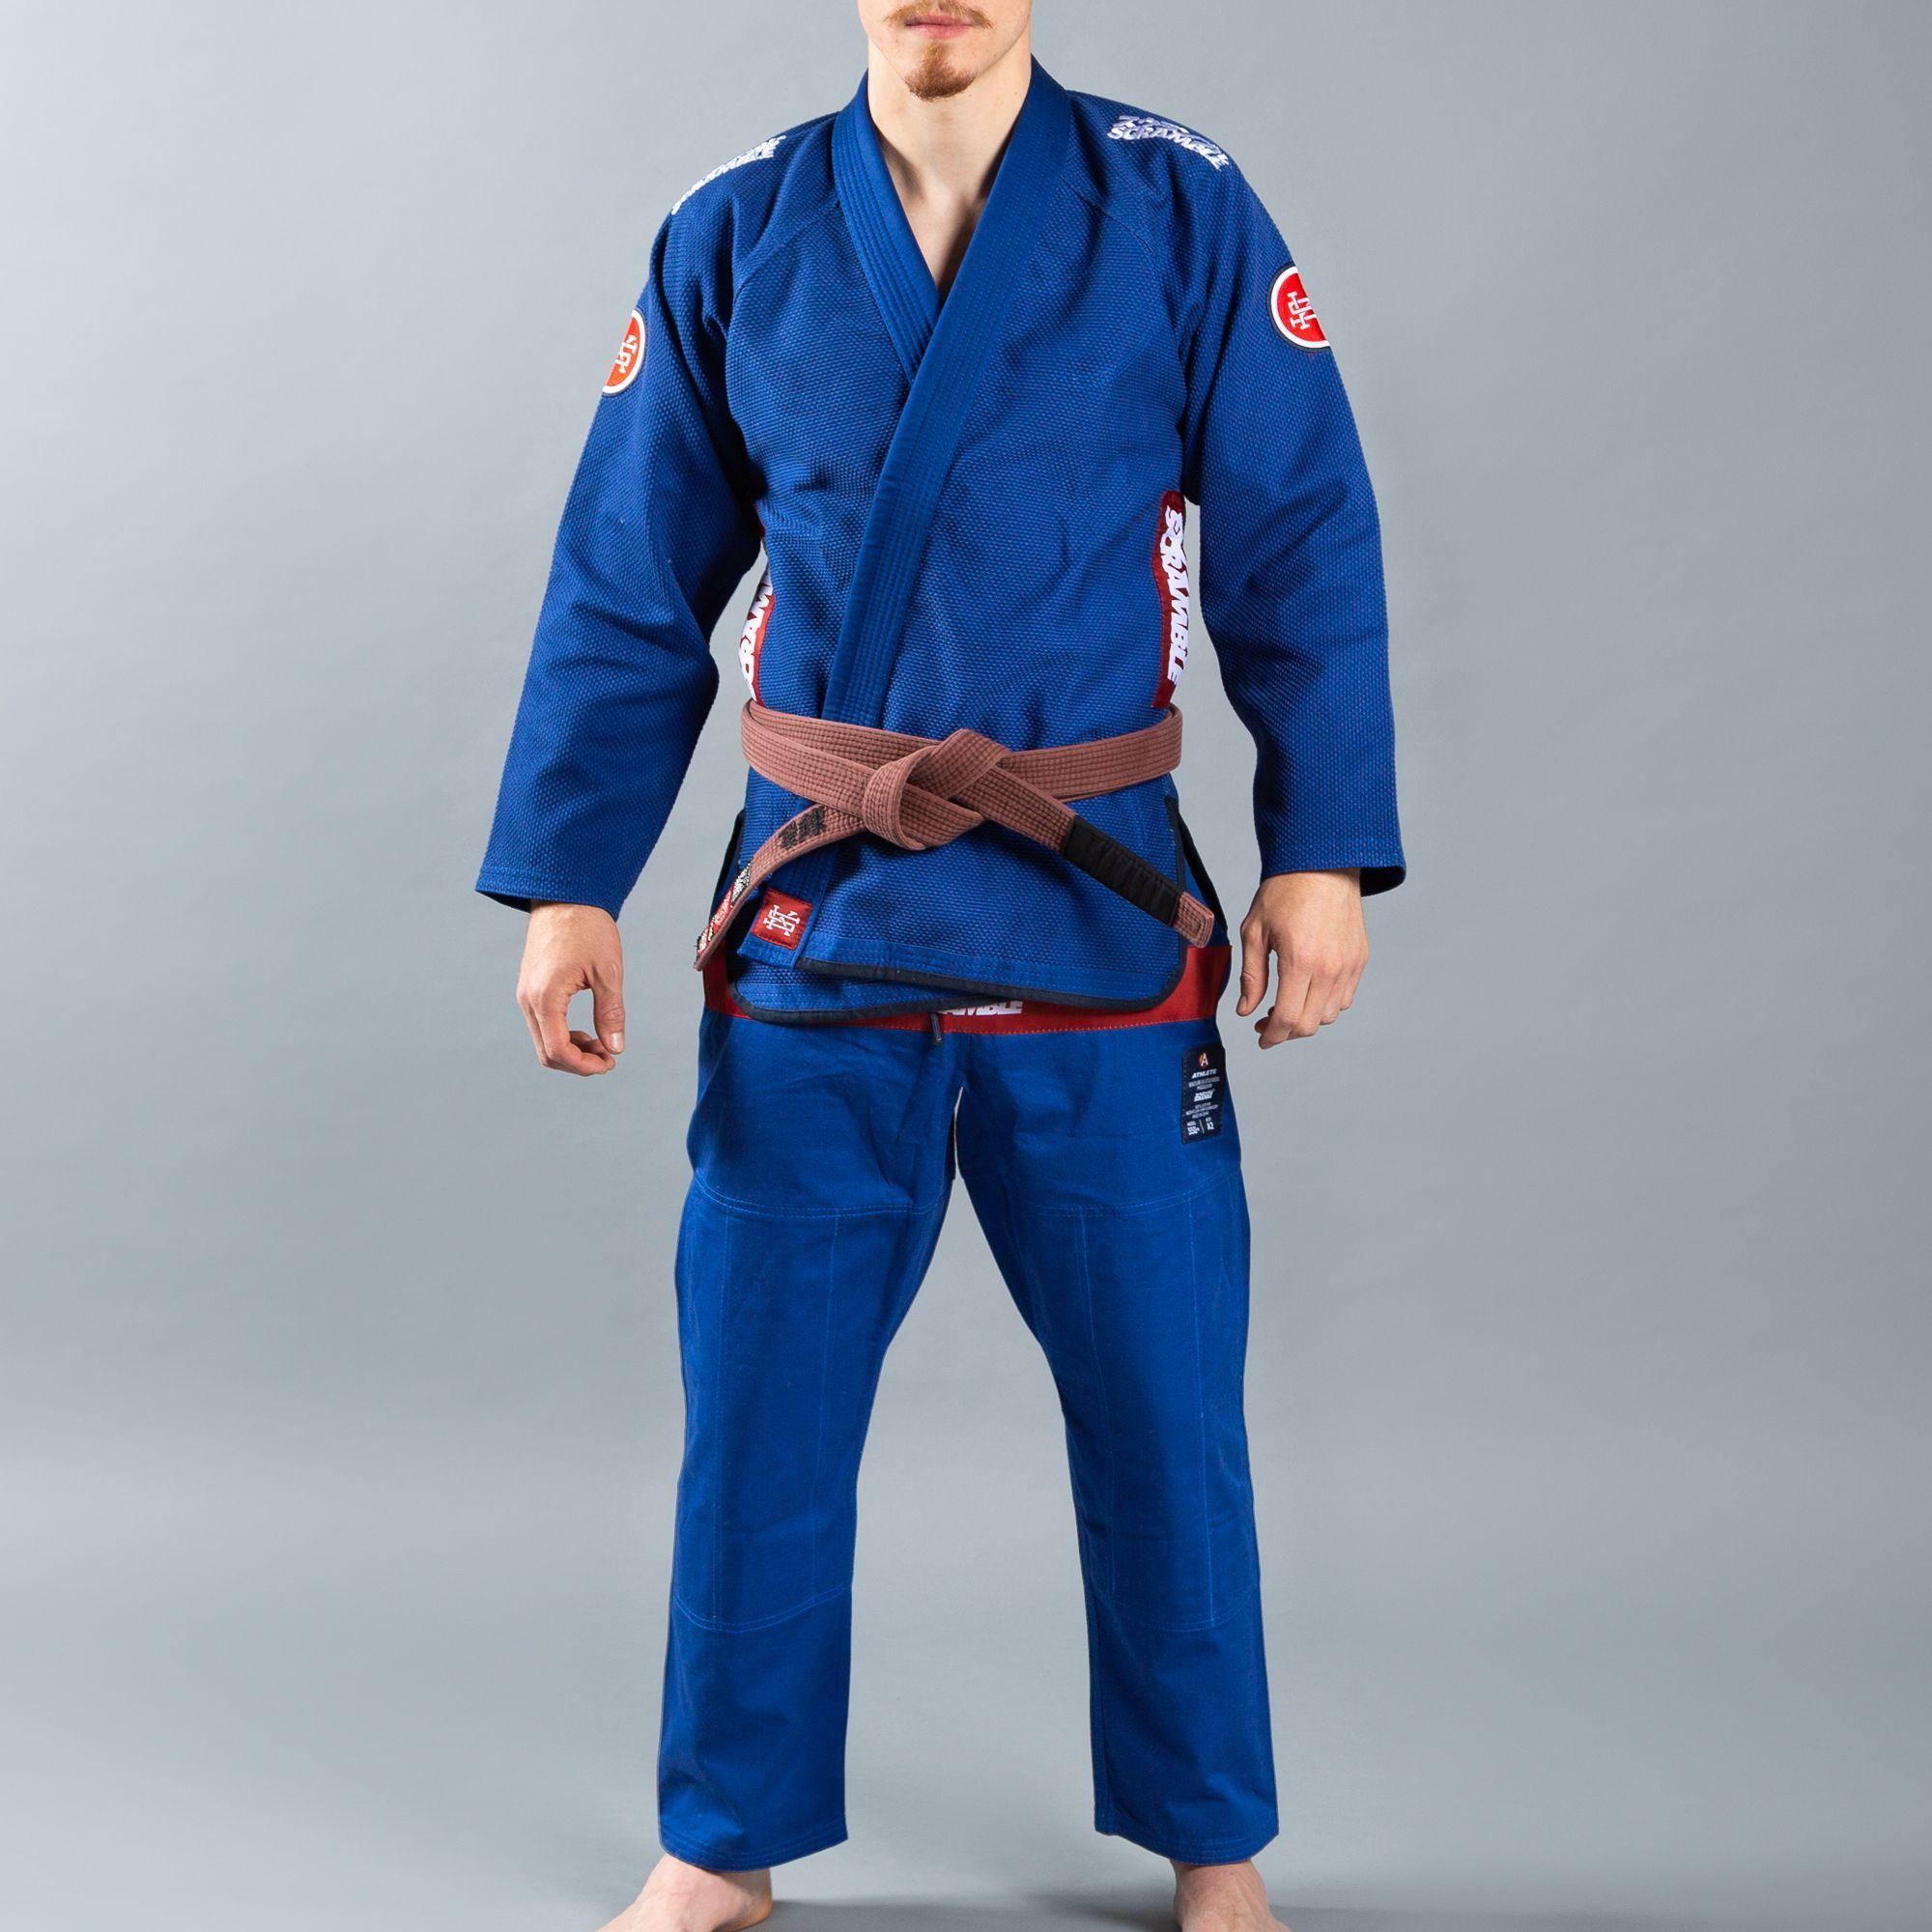 SCRAMBLE ATHLETE 4: 550+ ( ブルー、青)|ブラジリアン柔術衣